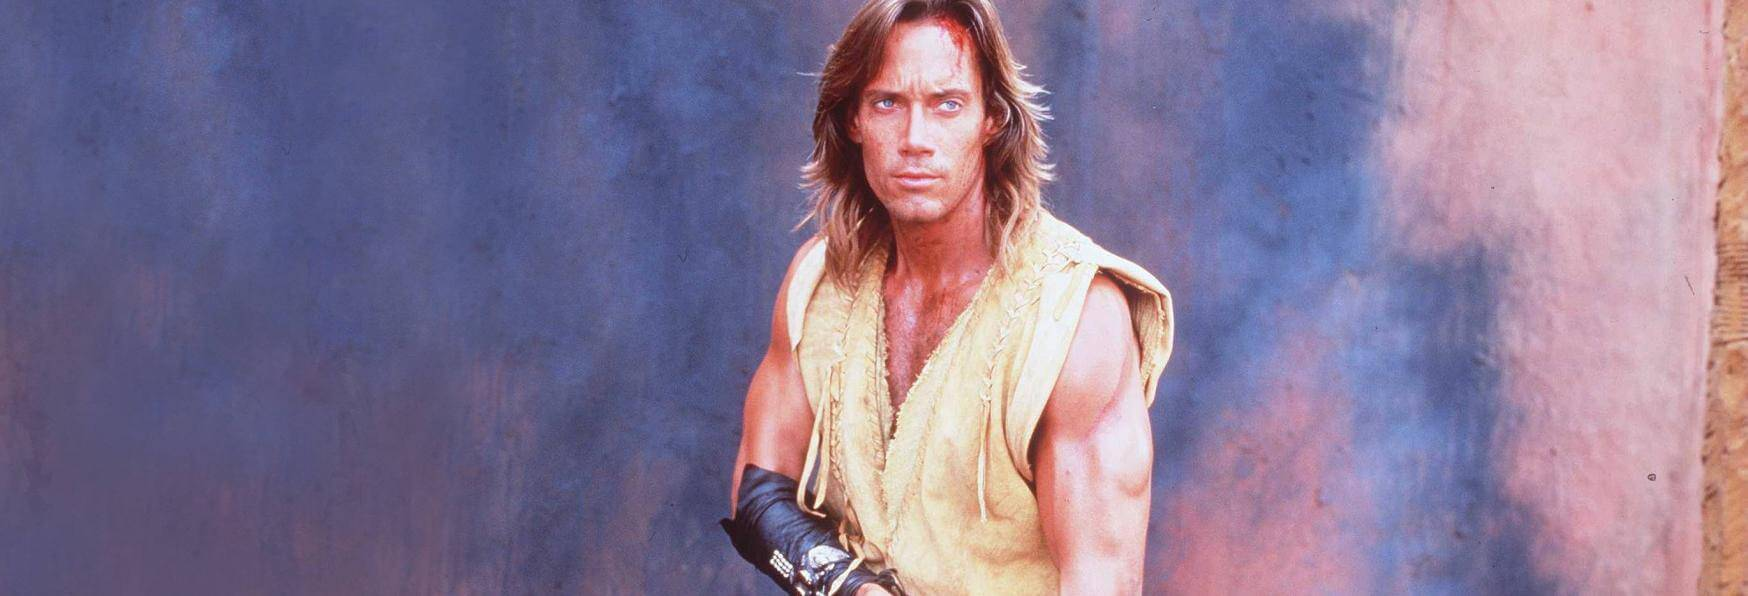 "Old but Serial: vi Ricordate di ""Hercules, the Legendary Journeys""?"